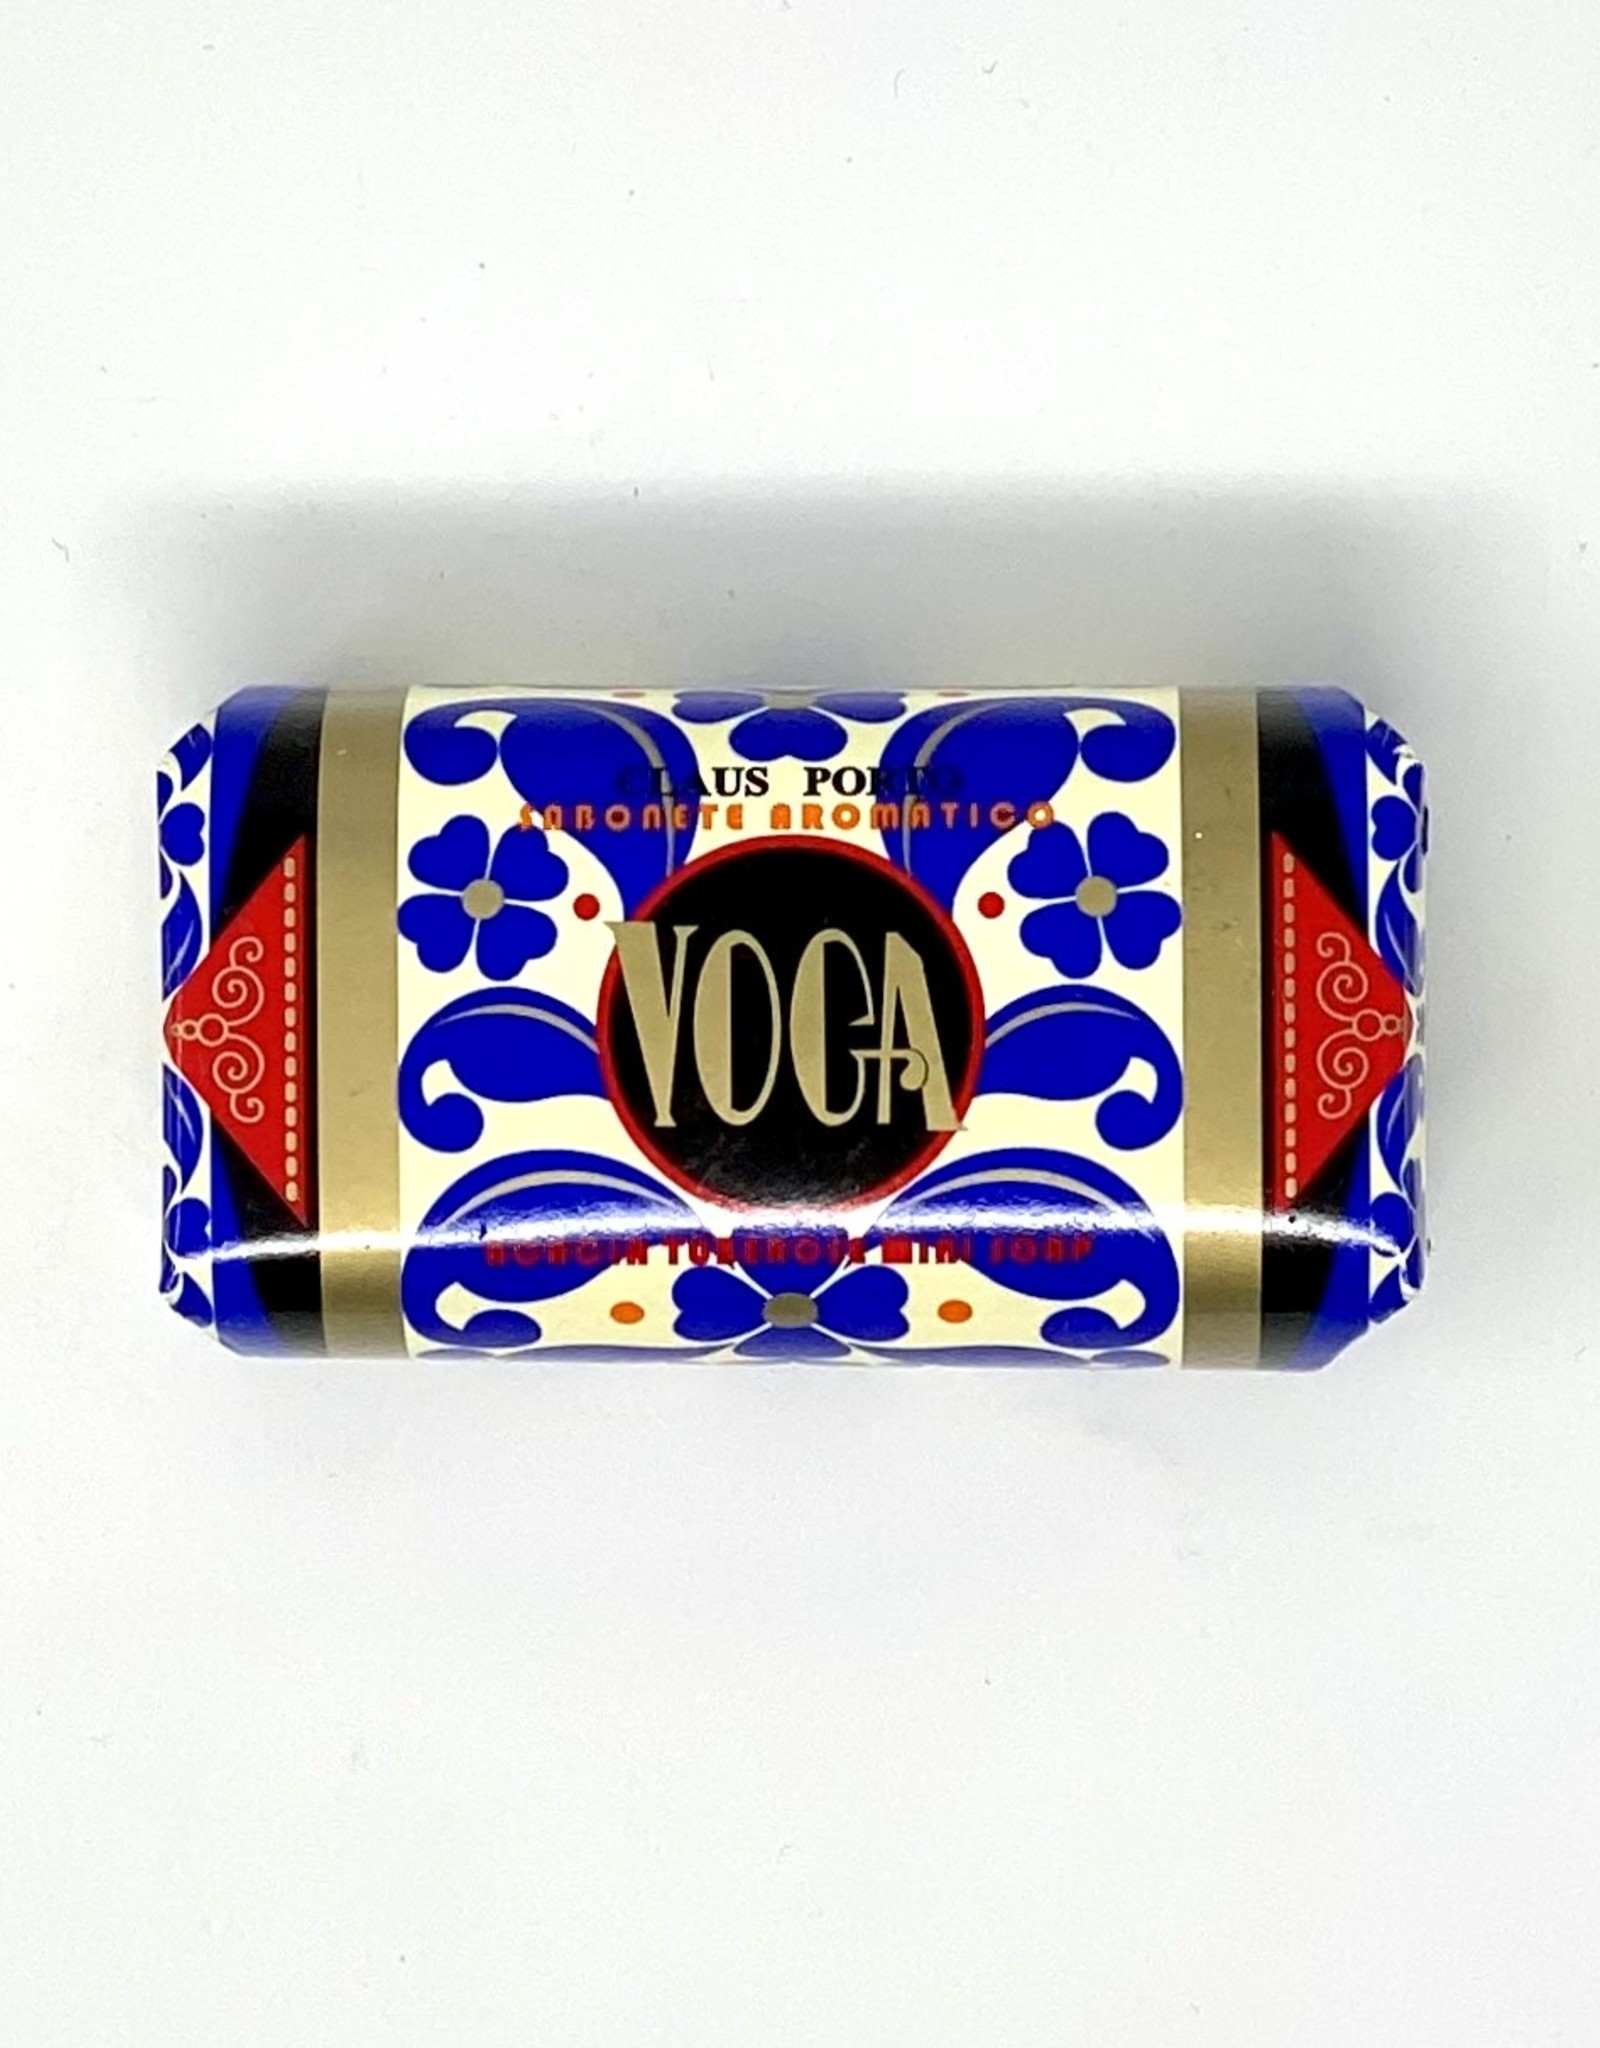 ClPo Voga Mini Bar Soap